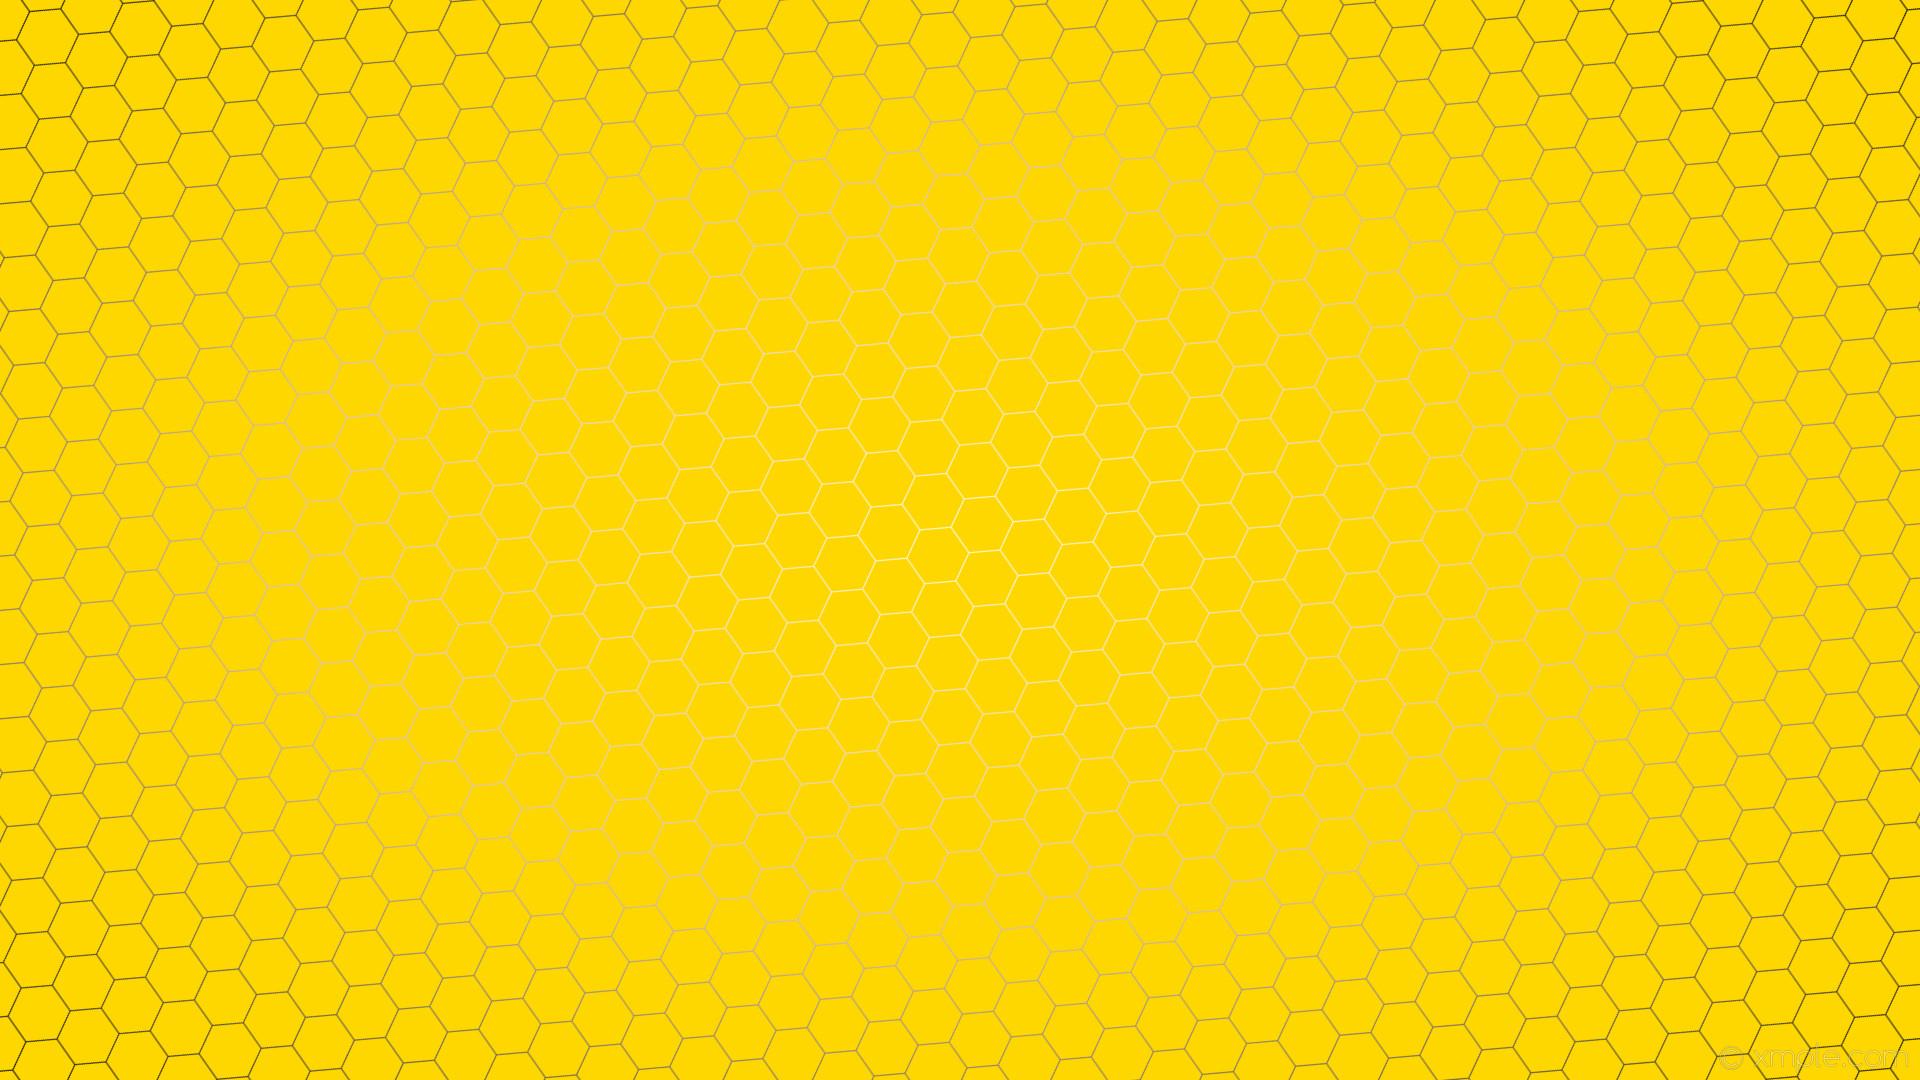 wallpaper glow yellow hexagon black gradient purple white gold thistle  #ffd700 #ffffff #d8bfd8